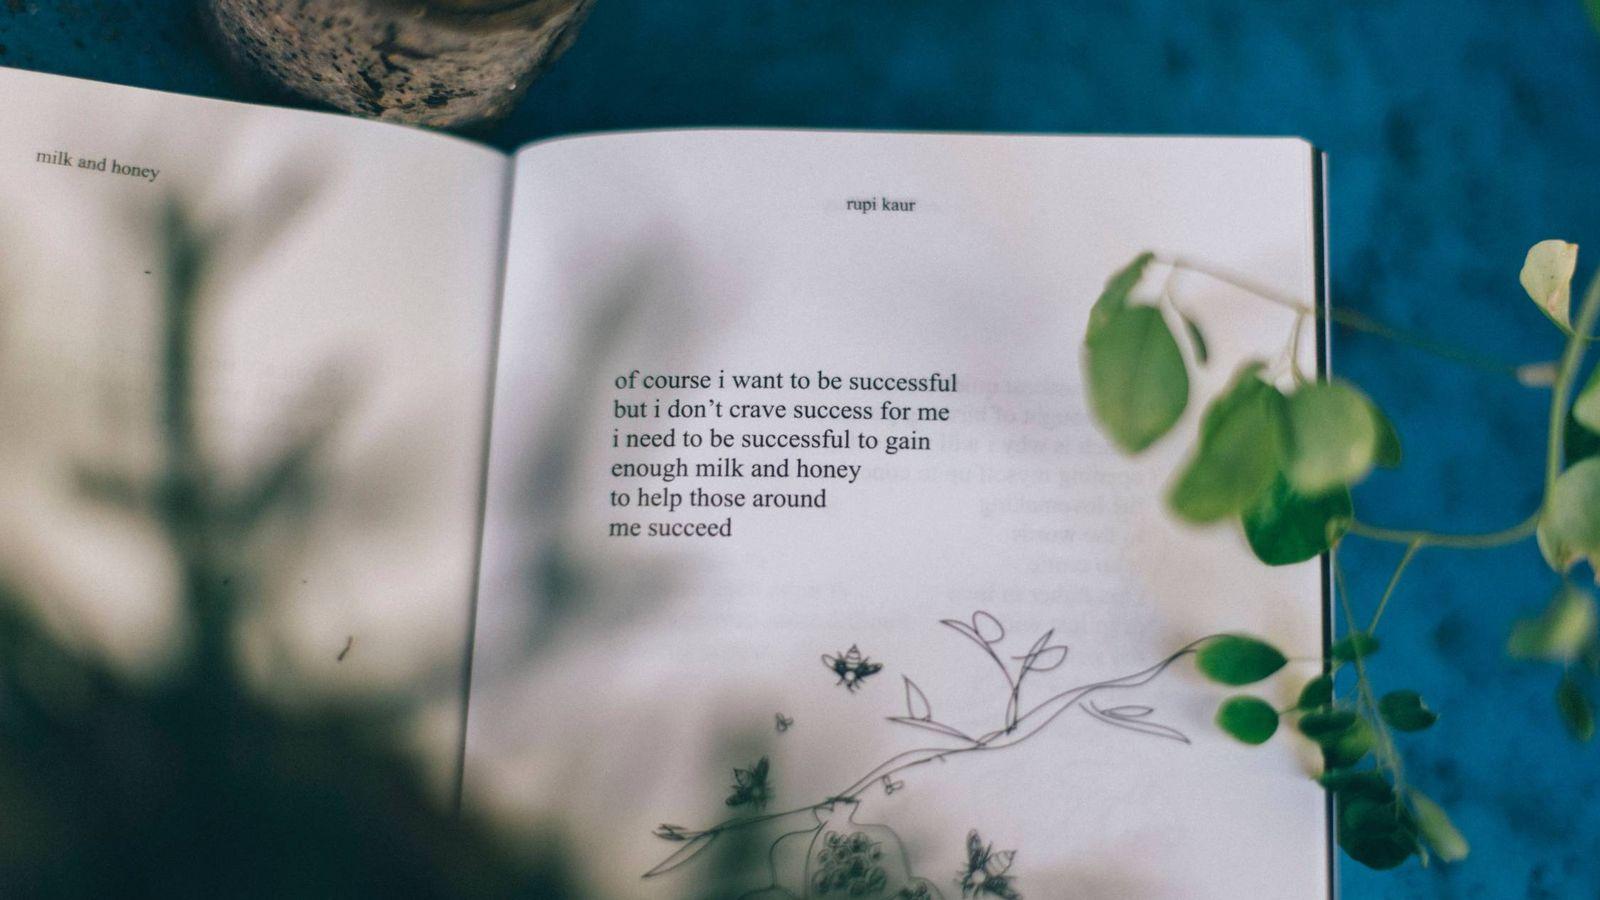 Foto: Poema de Rupi Kaur